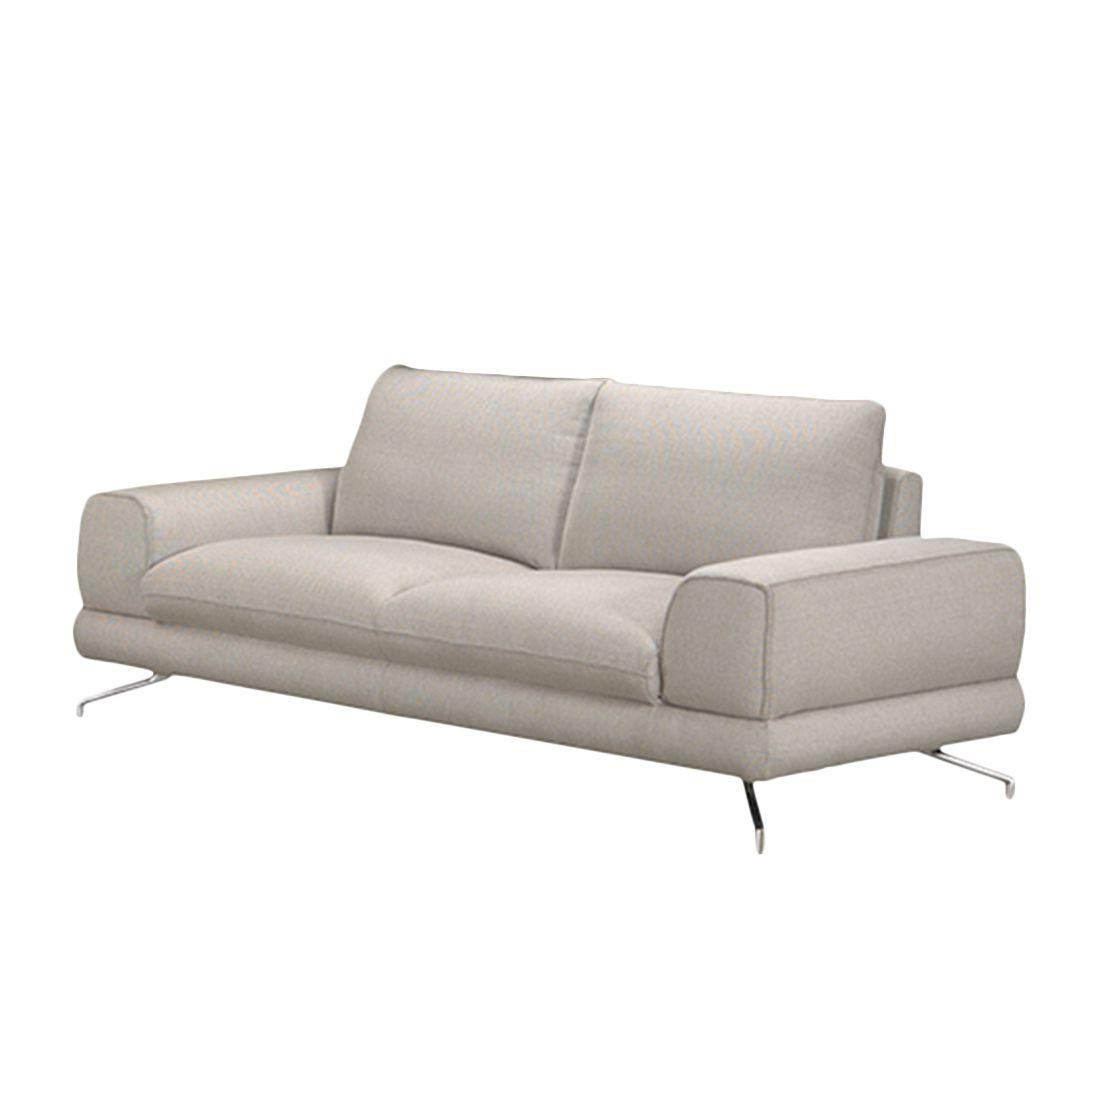 sofa lennard 3 sitzer strukturstoff mit kopfst tze. Black Bedroom Furniture Sets. Home Design Ideas